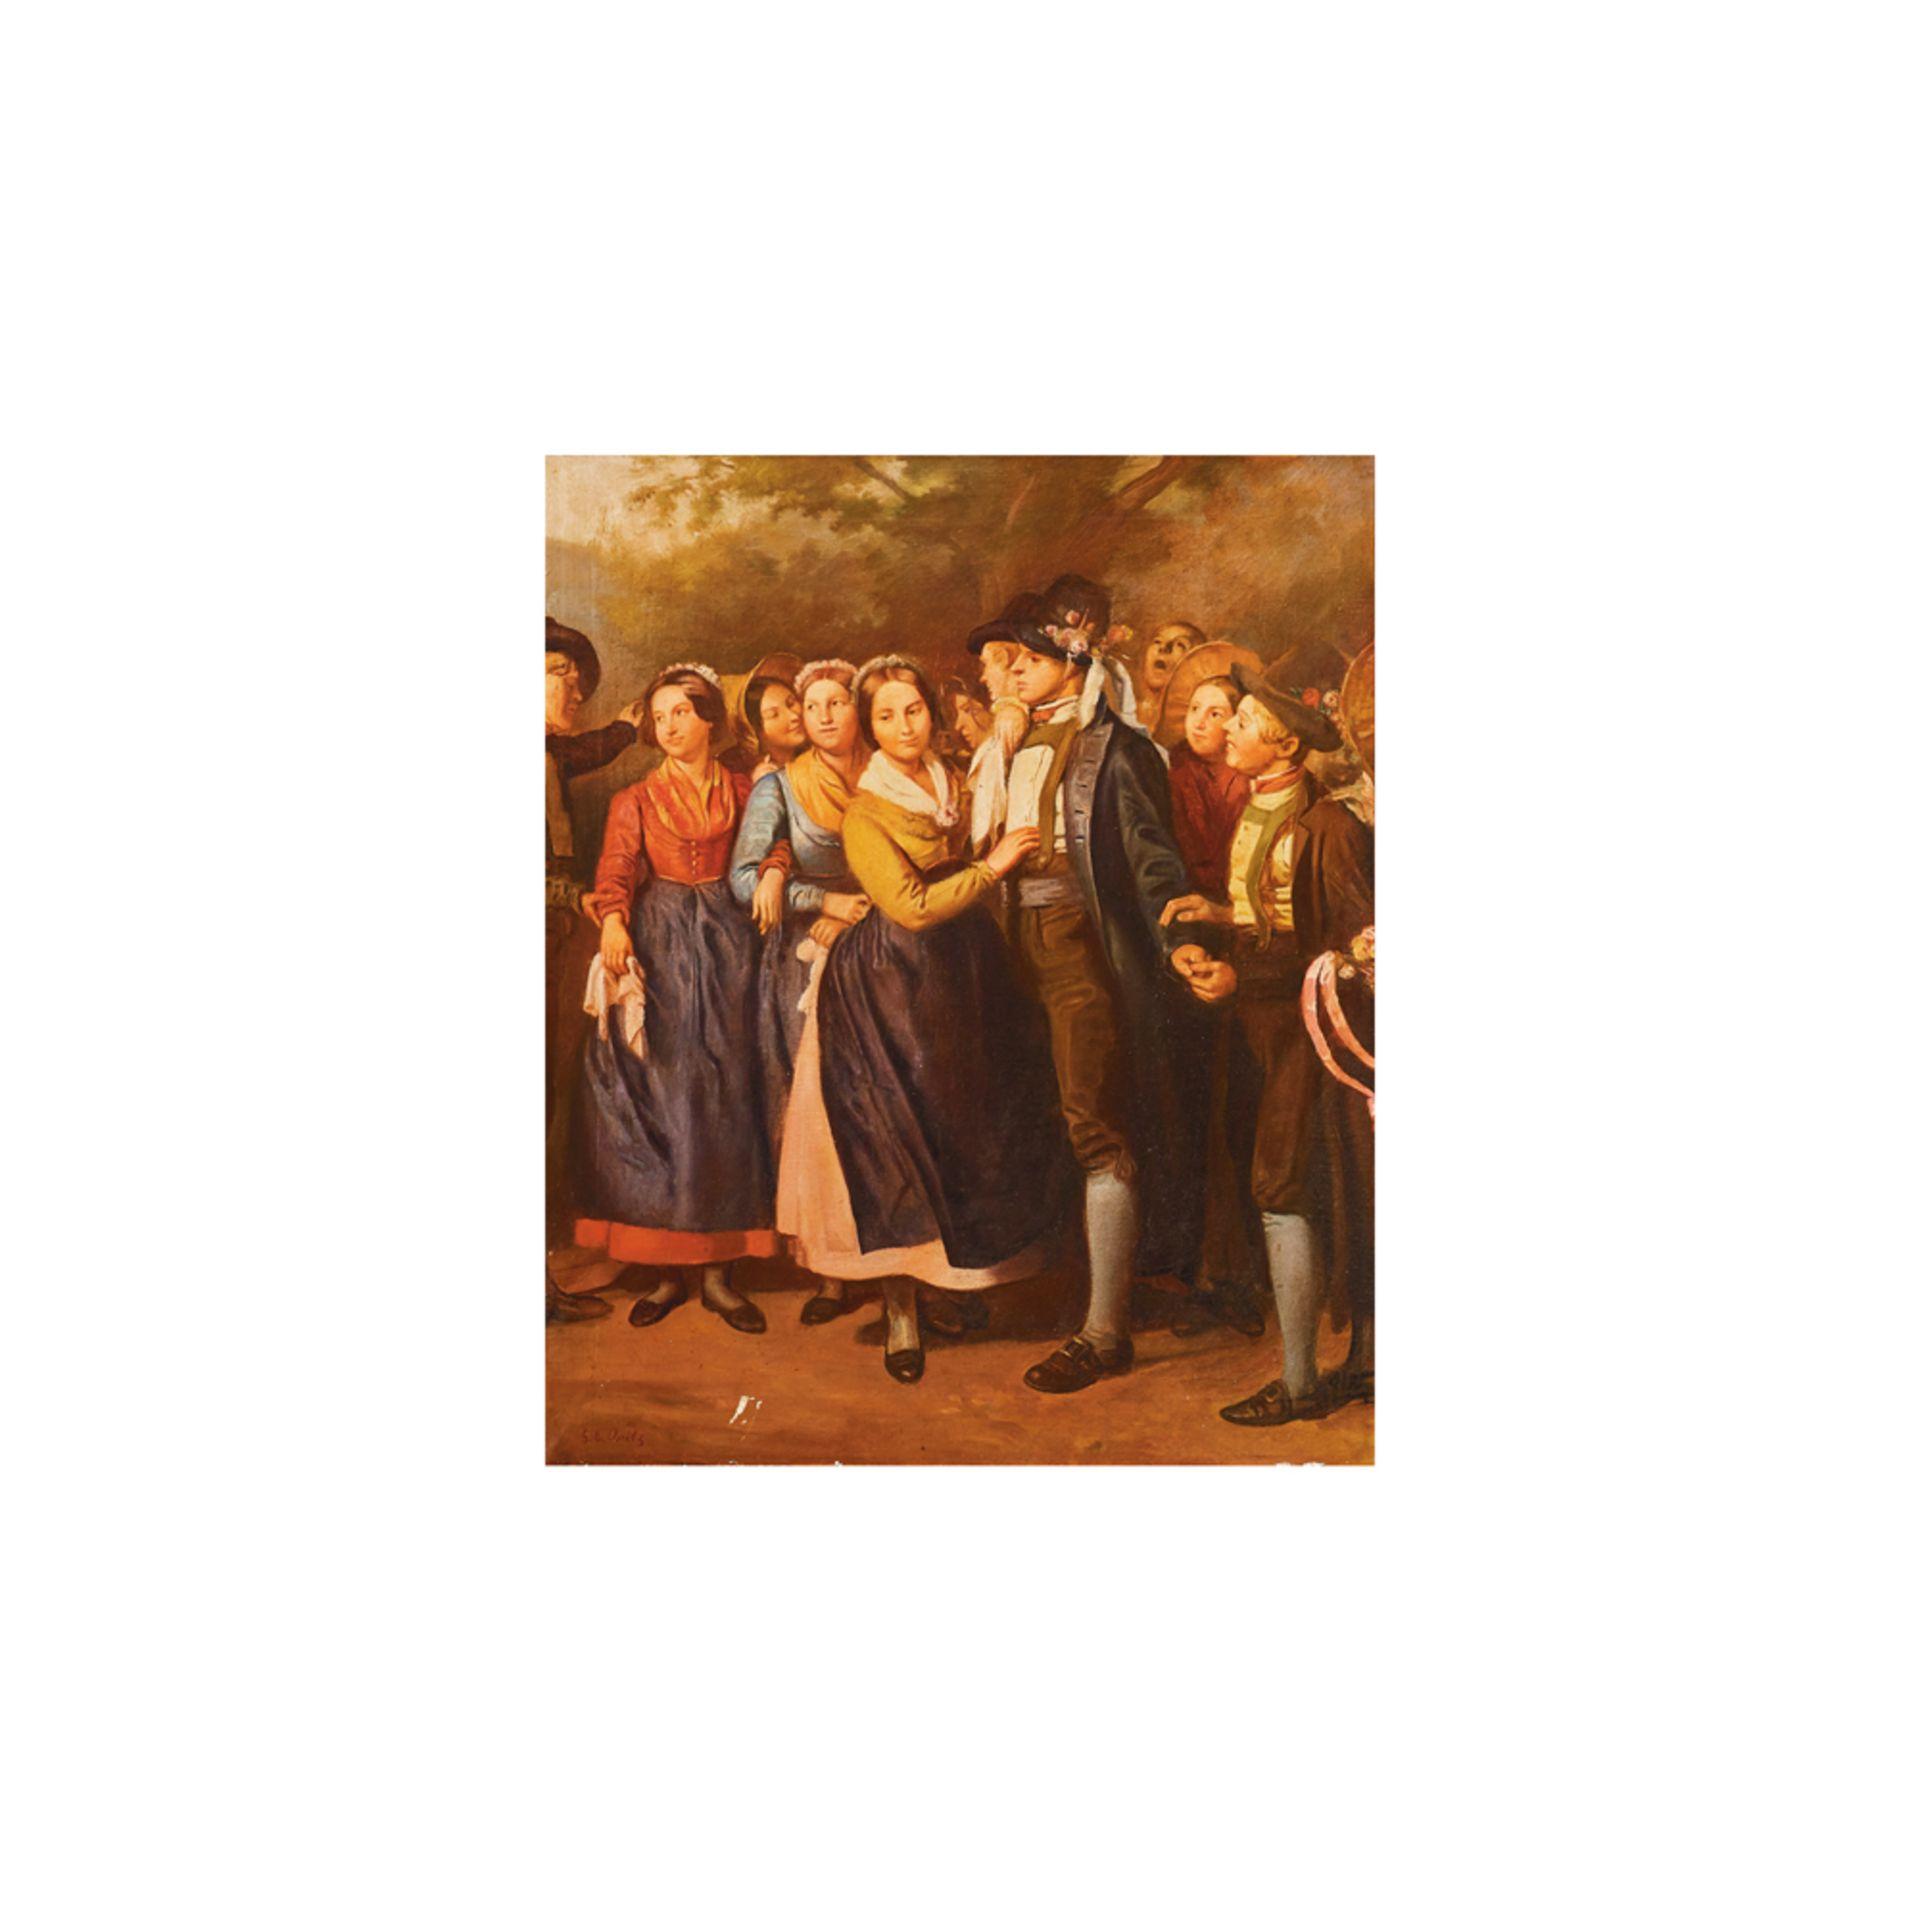 Los 16 - Escuela centroeuropea, s.XIX. Seguidor de Georg Emanuel Opiz. Personajes. Óleo sobre tela.